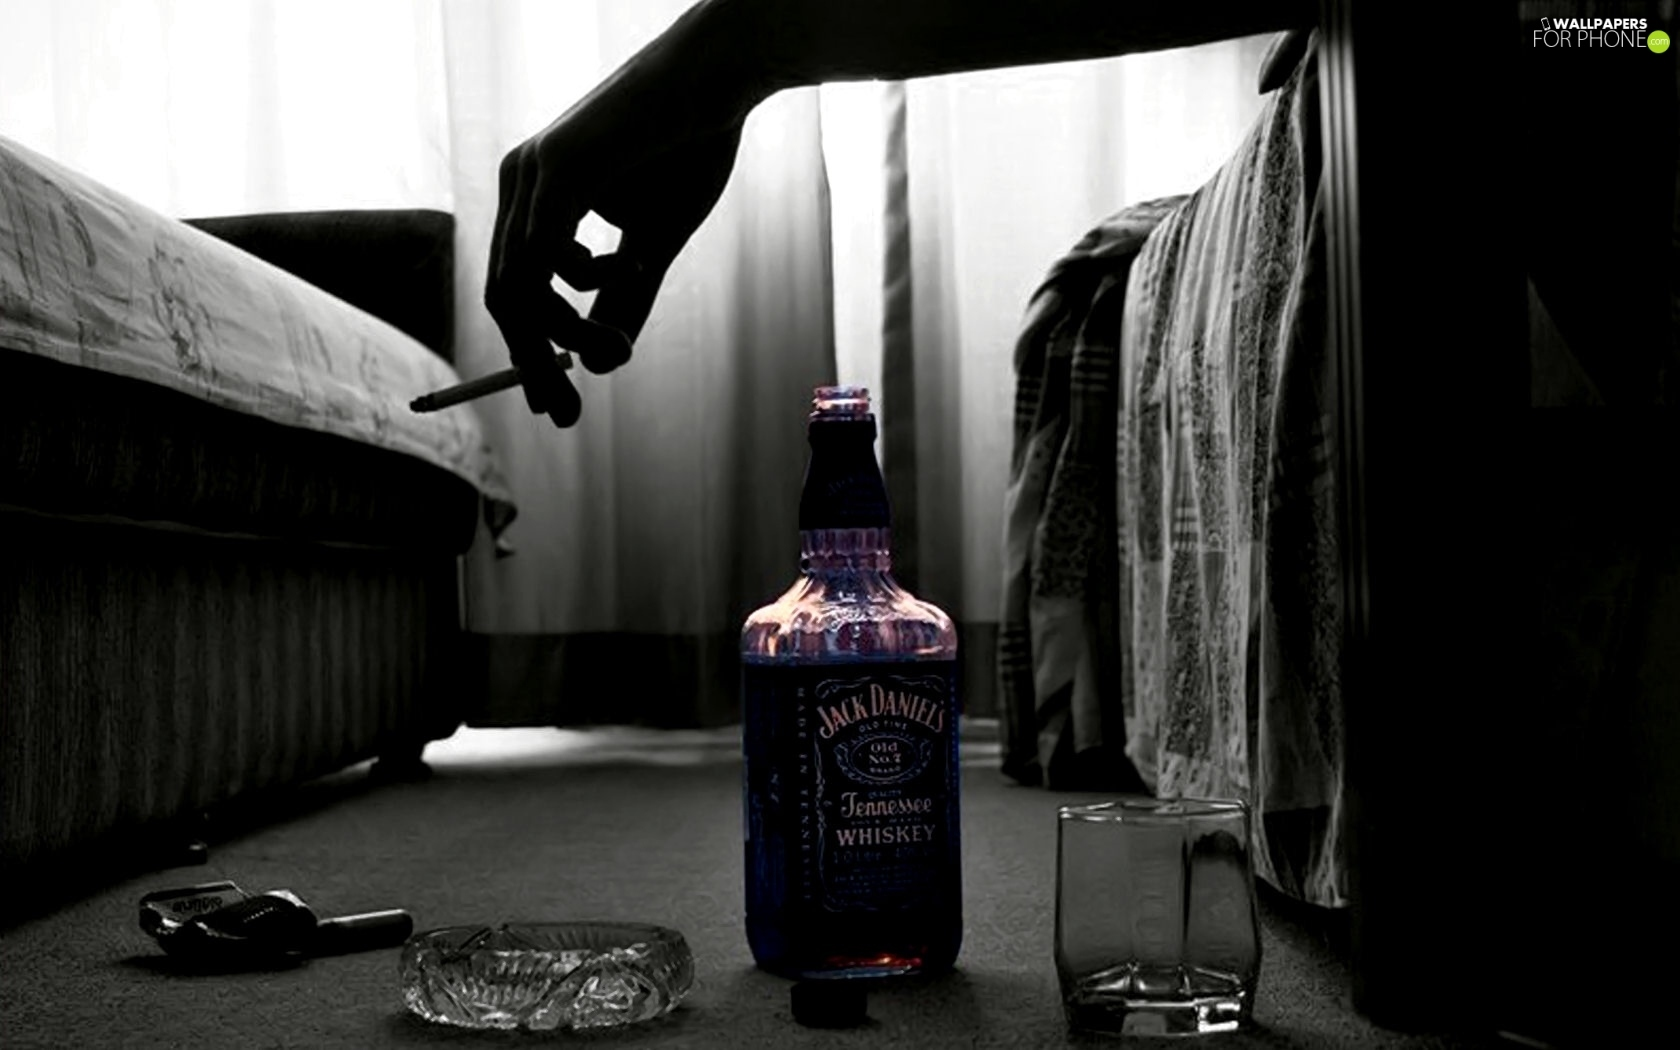 Cigarette Alcohol Hand